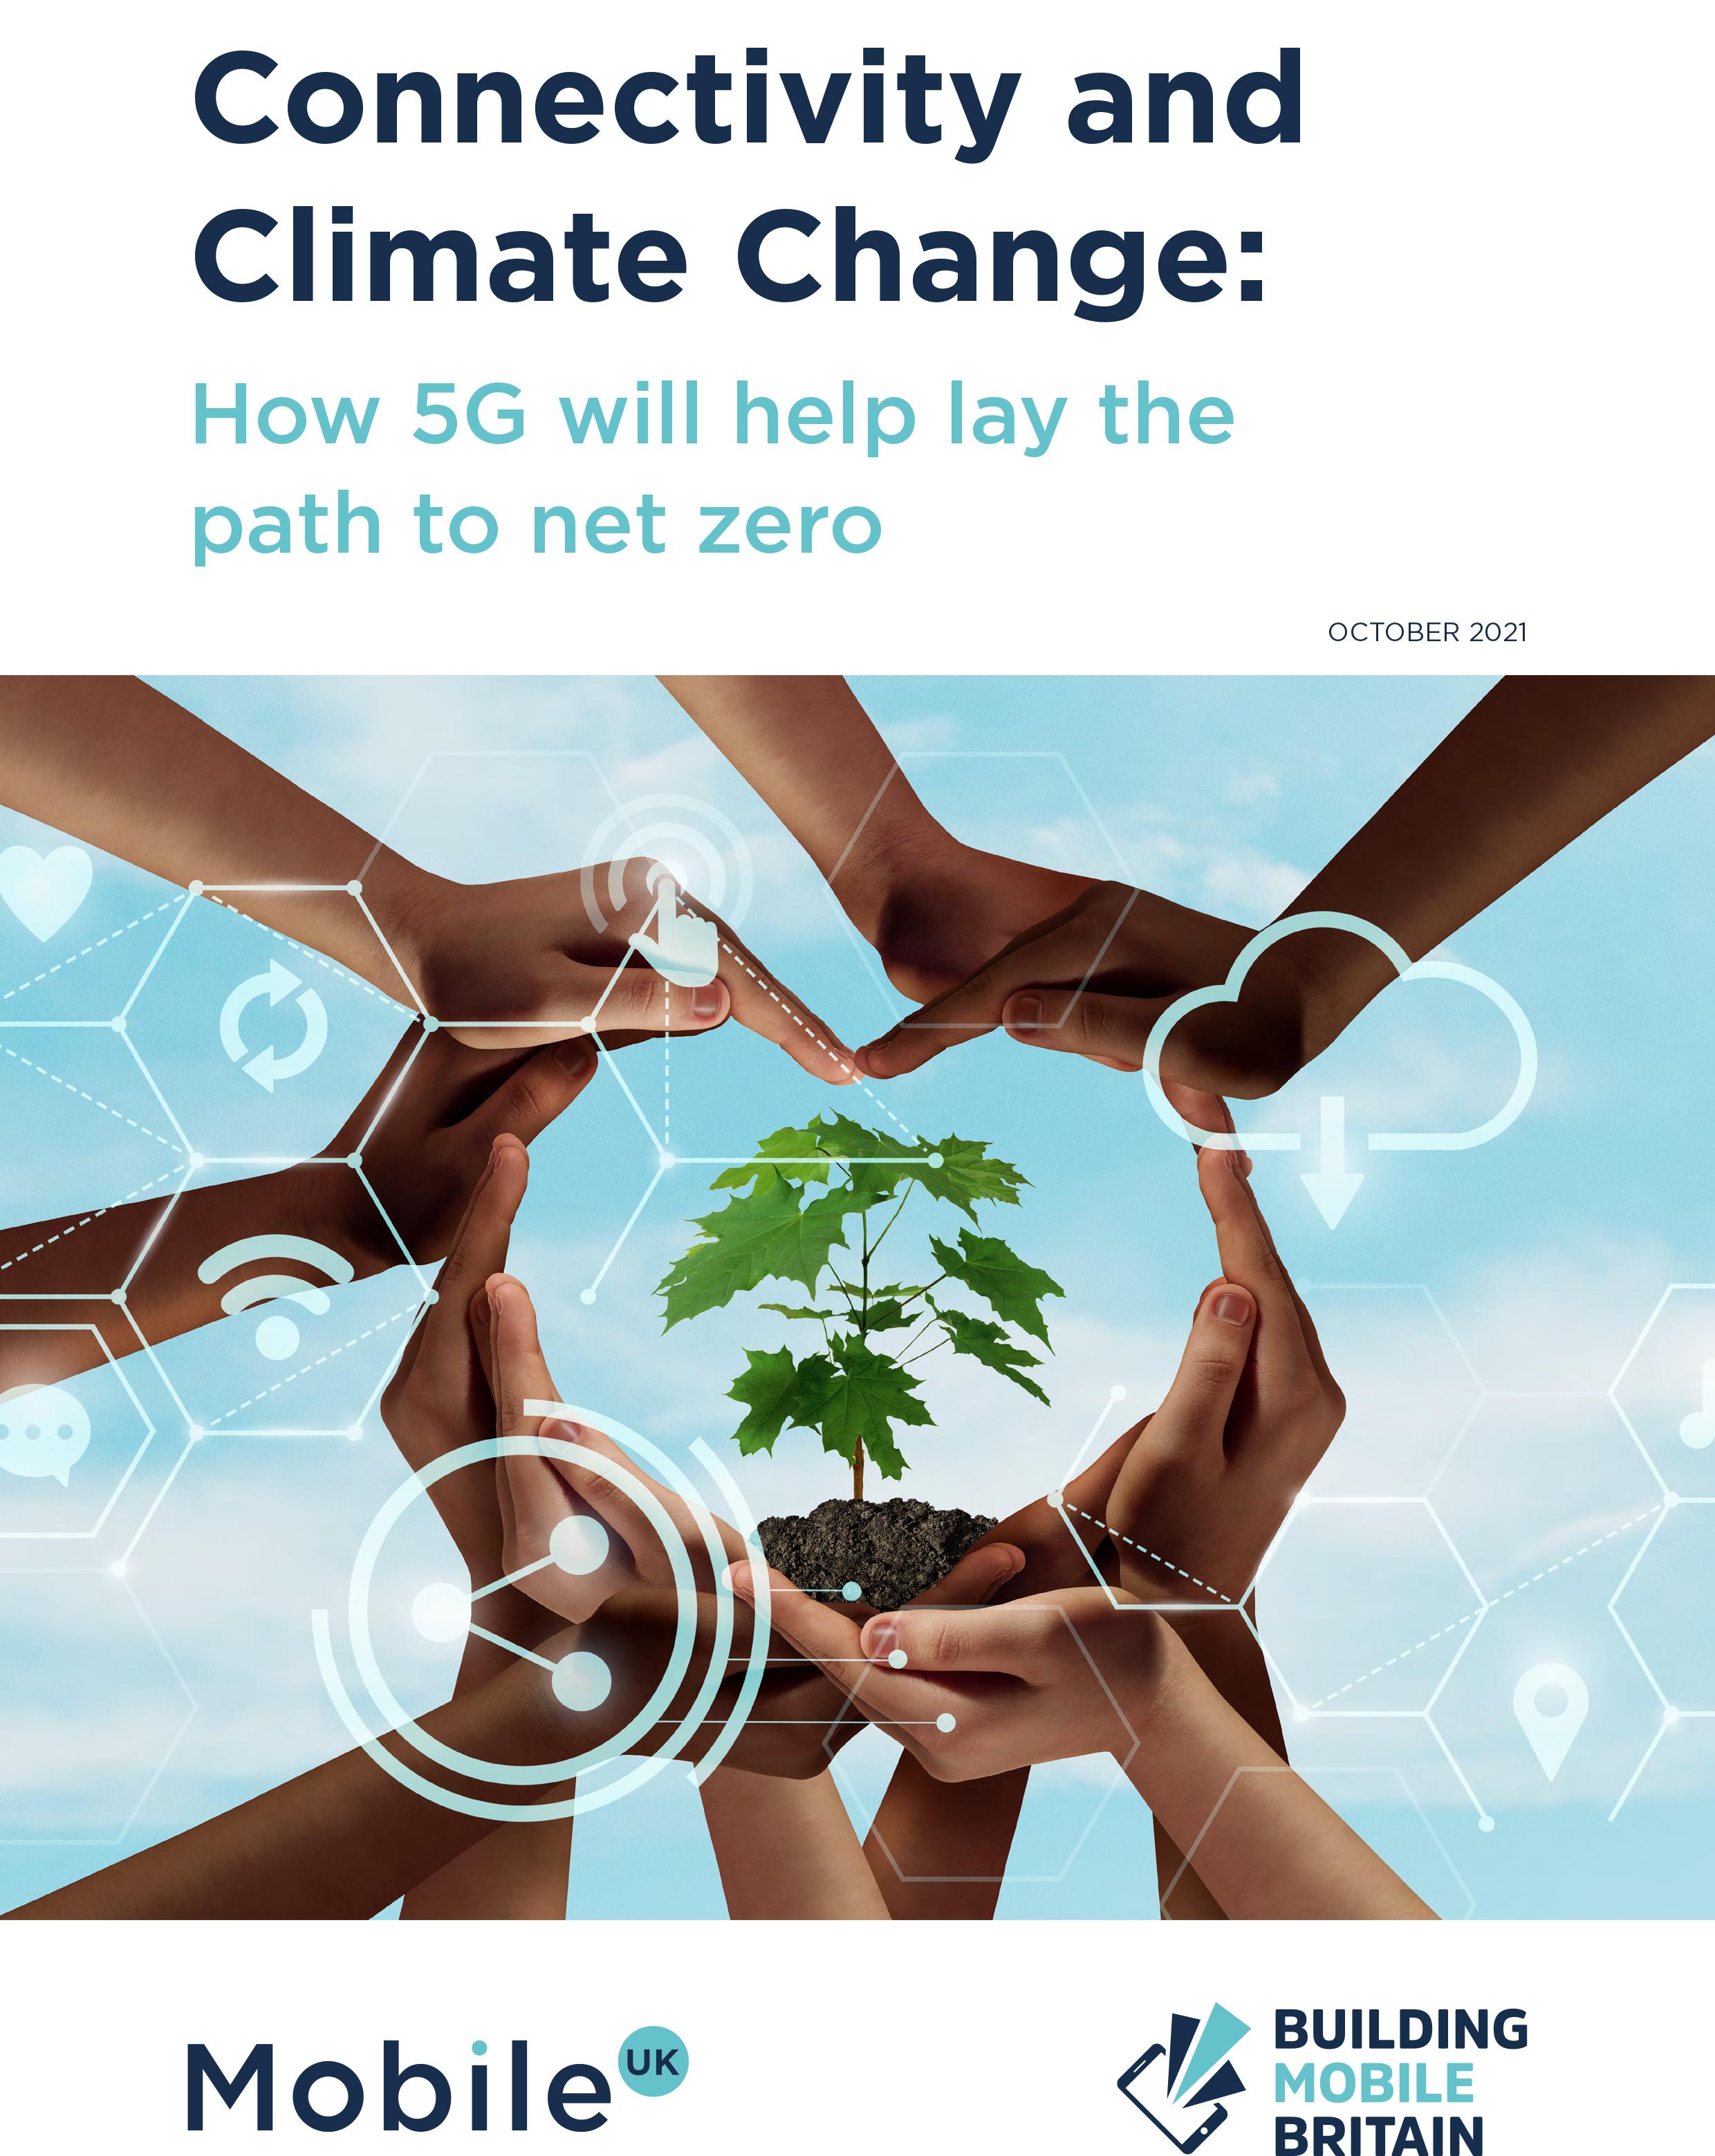 Mobile UK, Climate Change, COP26, BuildingMobileBritain, #BuildingMobileBritain, #5G, 5G, #5GCheckTheFacts